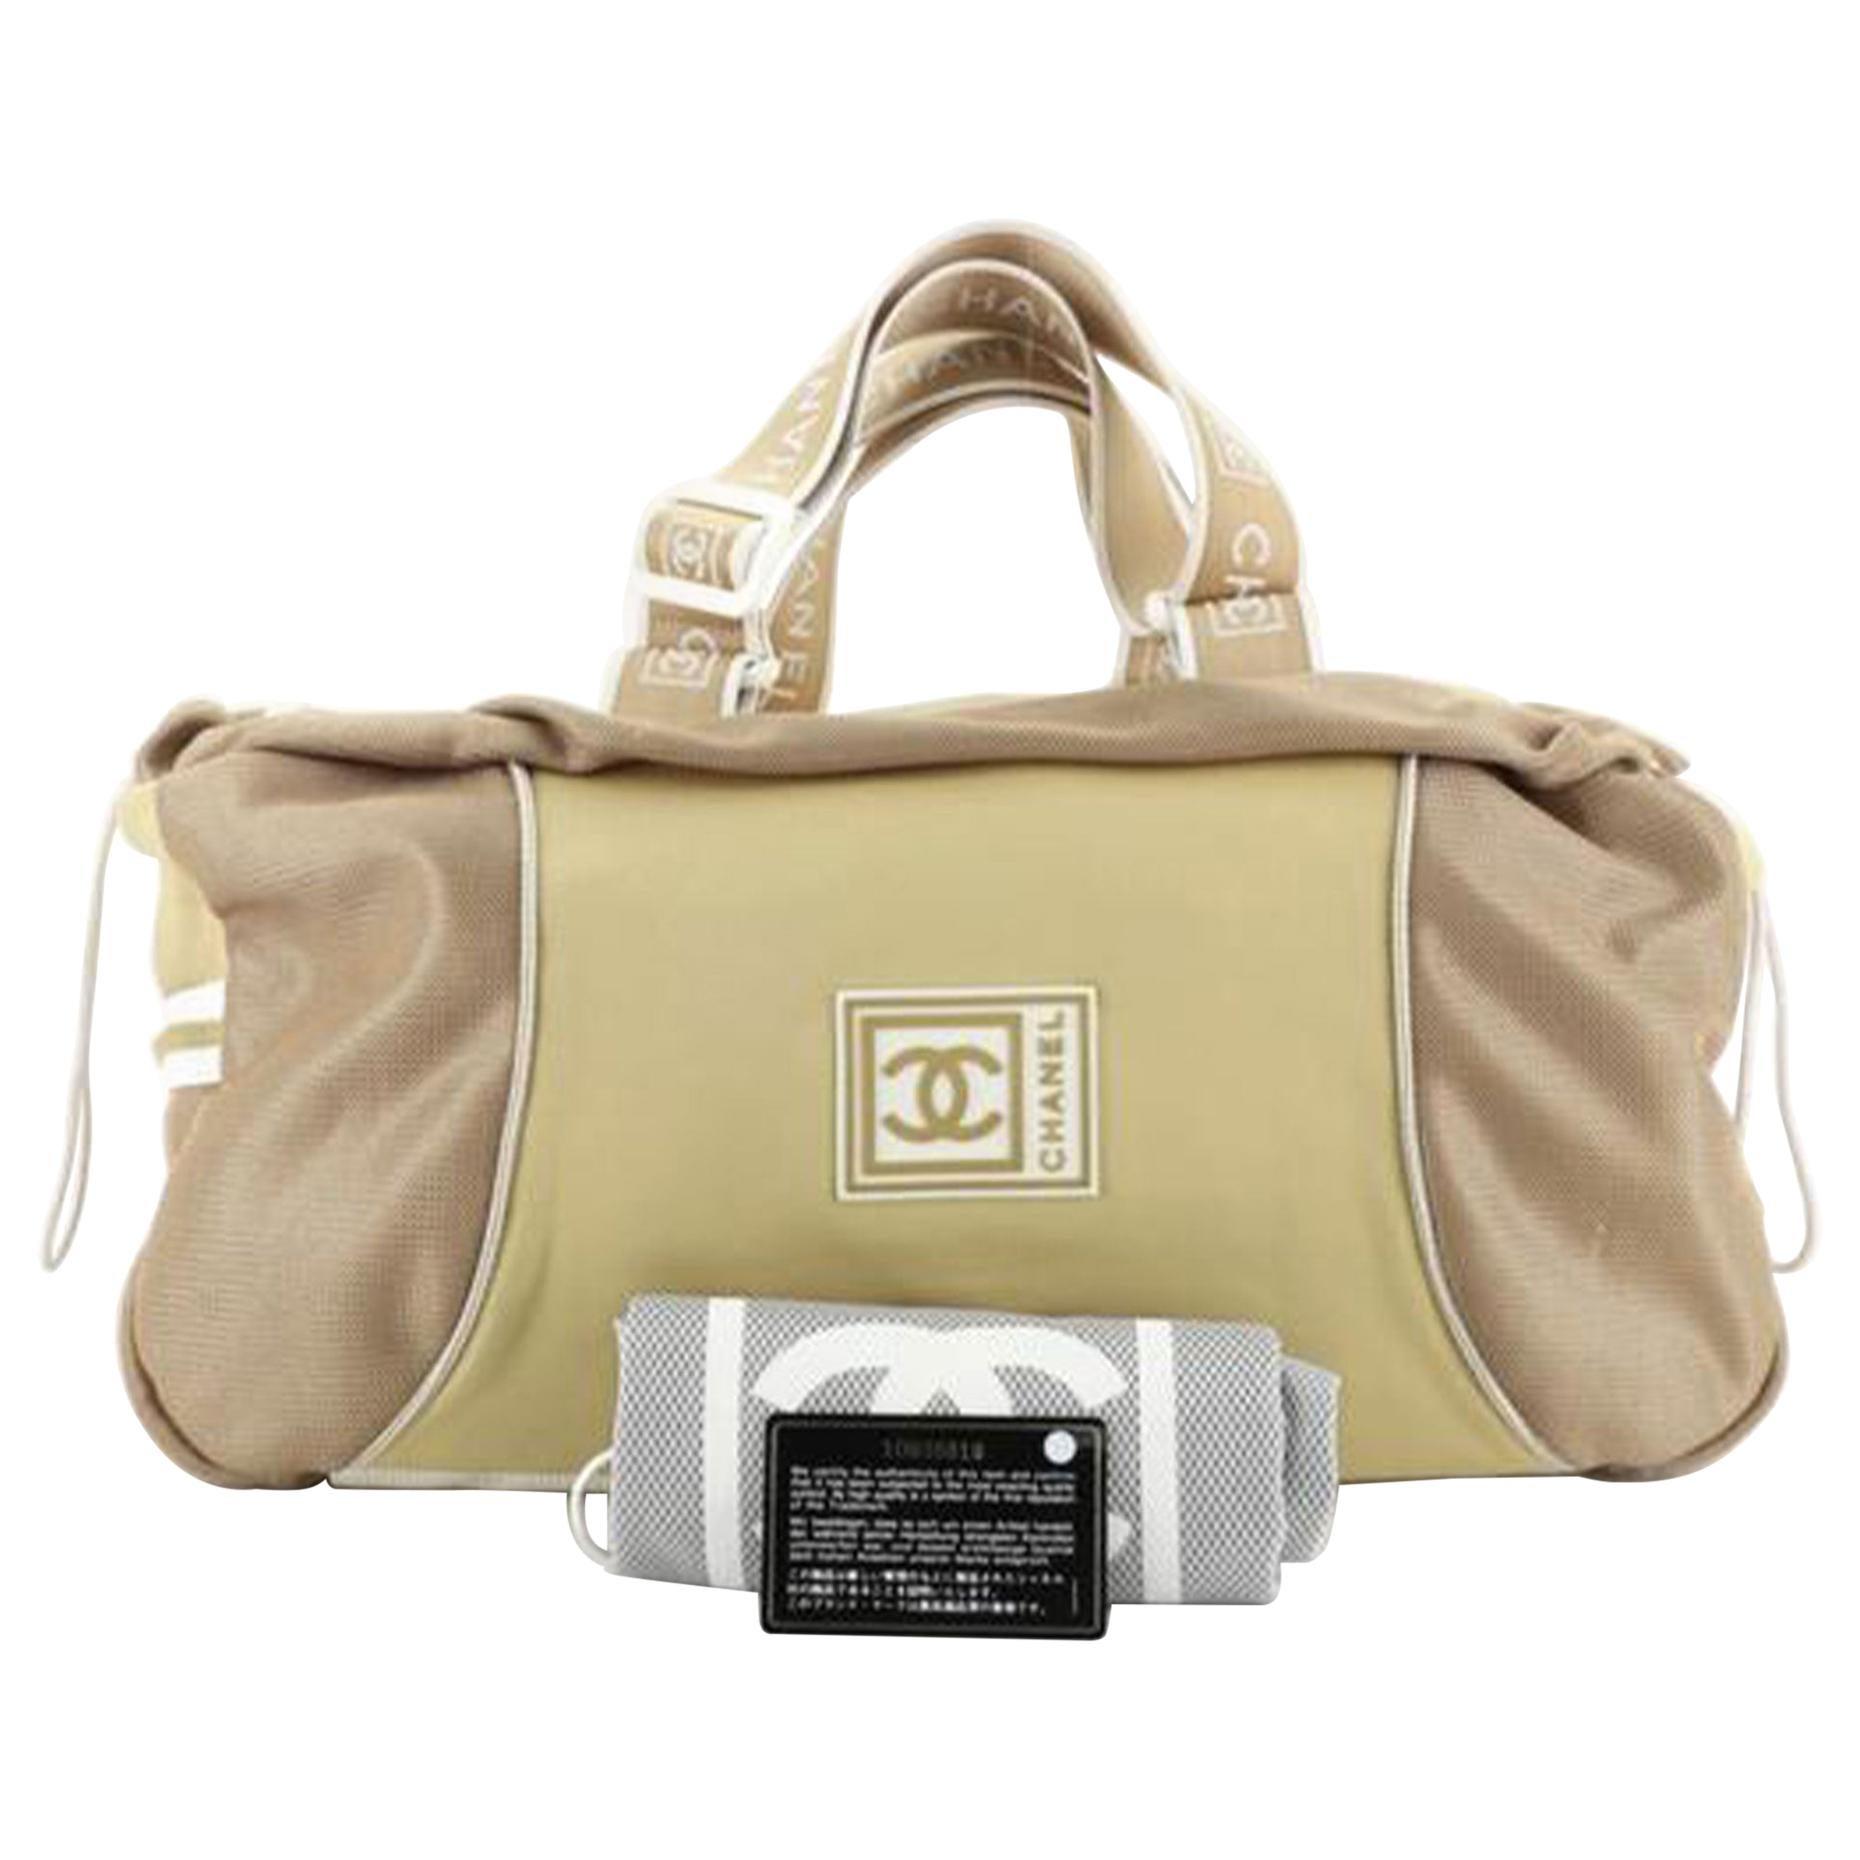 Chanel Shopping Tote Duffle Cc Sport Line Beige Nylon